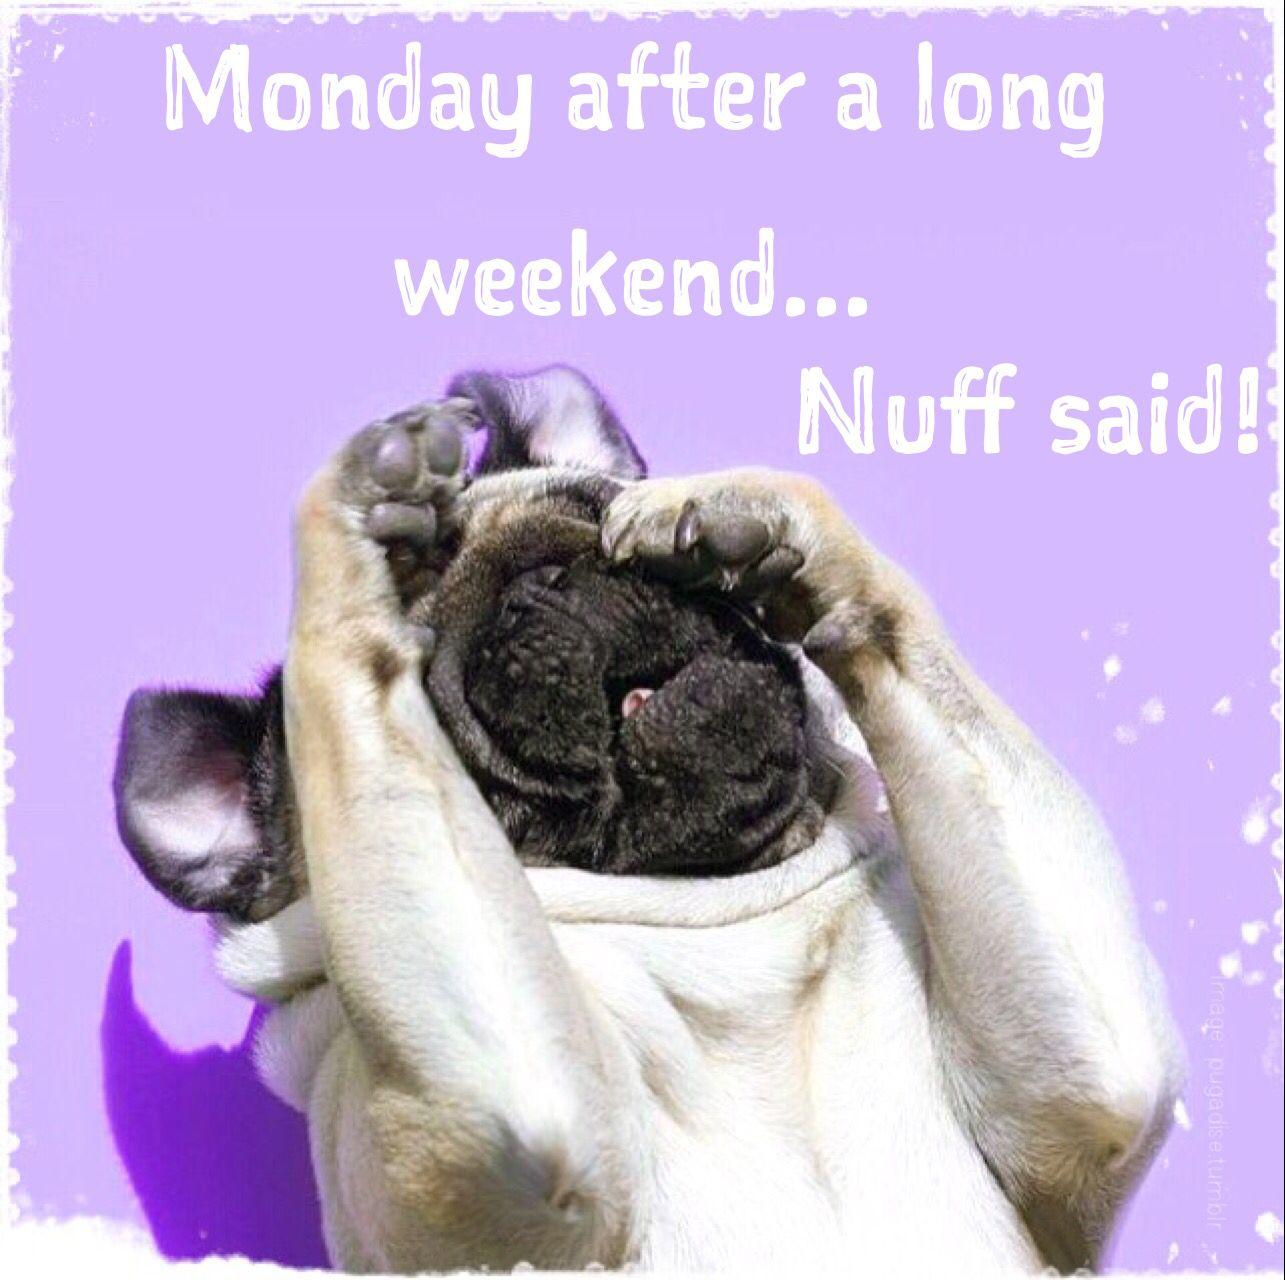 Monday humor Animal funny Cute dog Long weekend